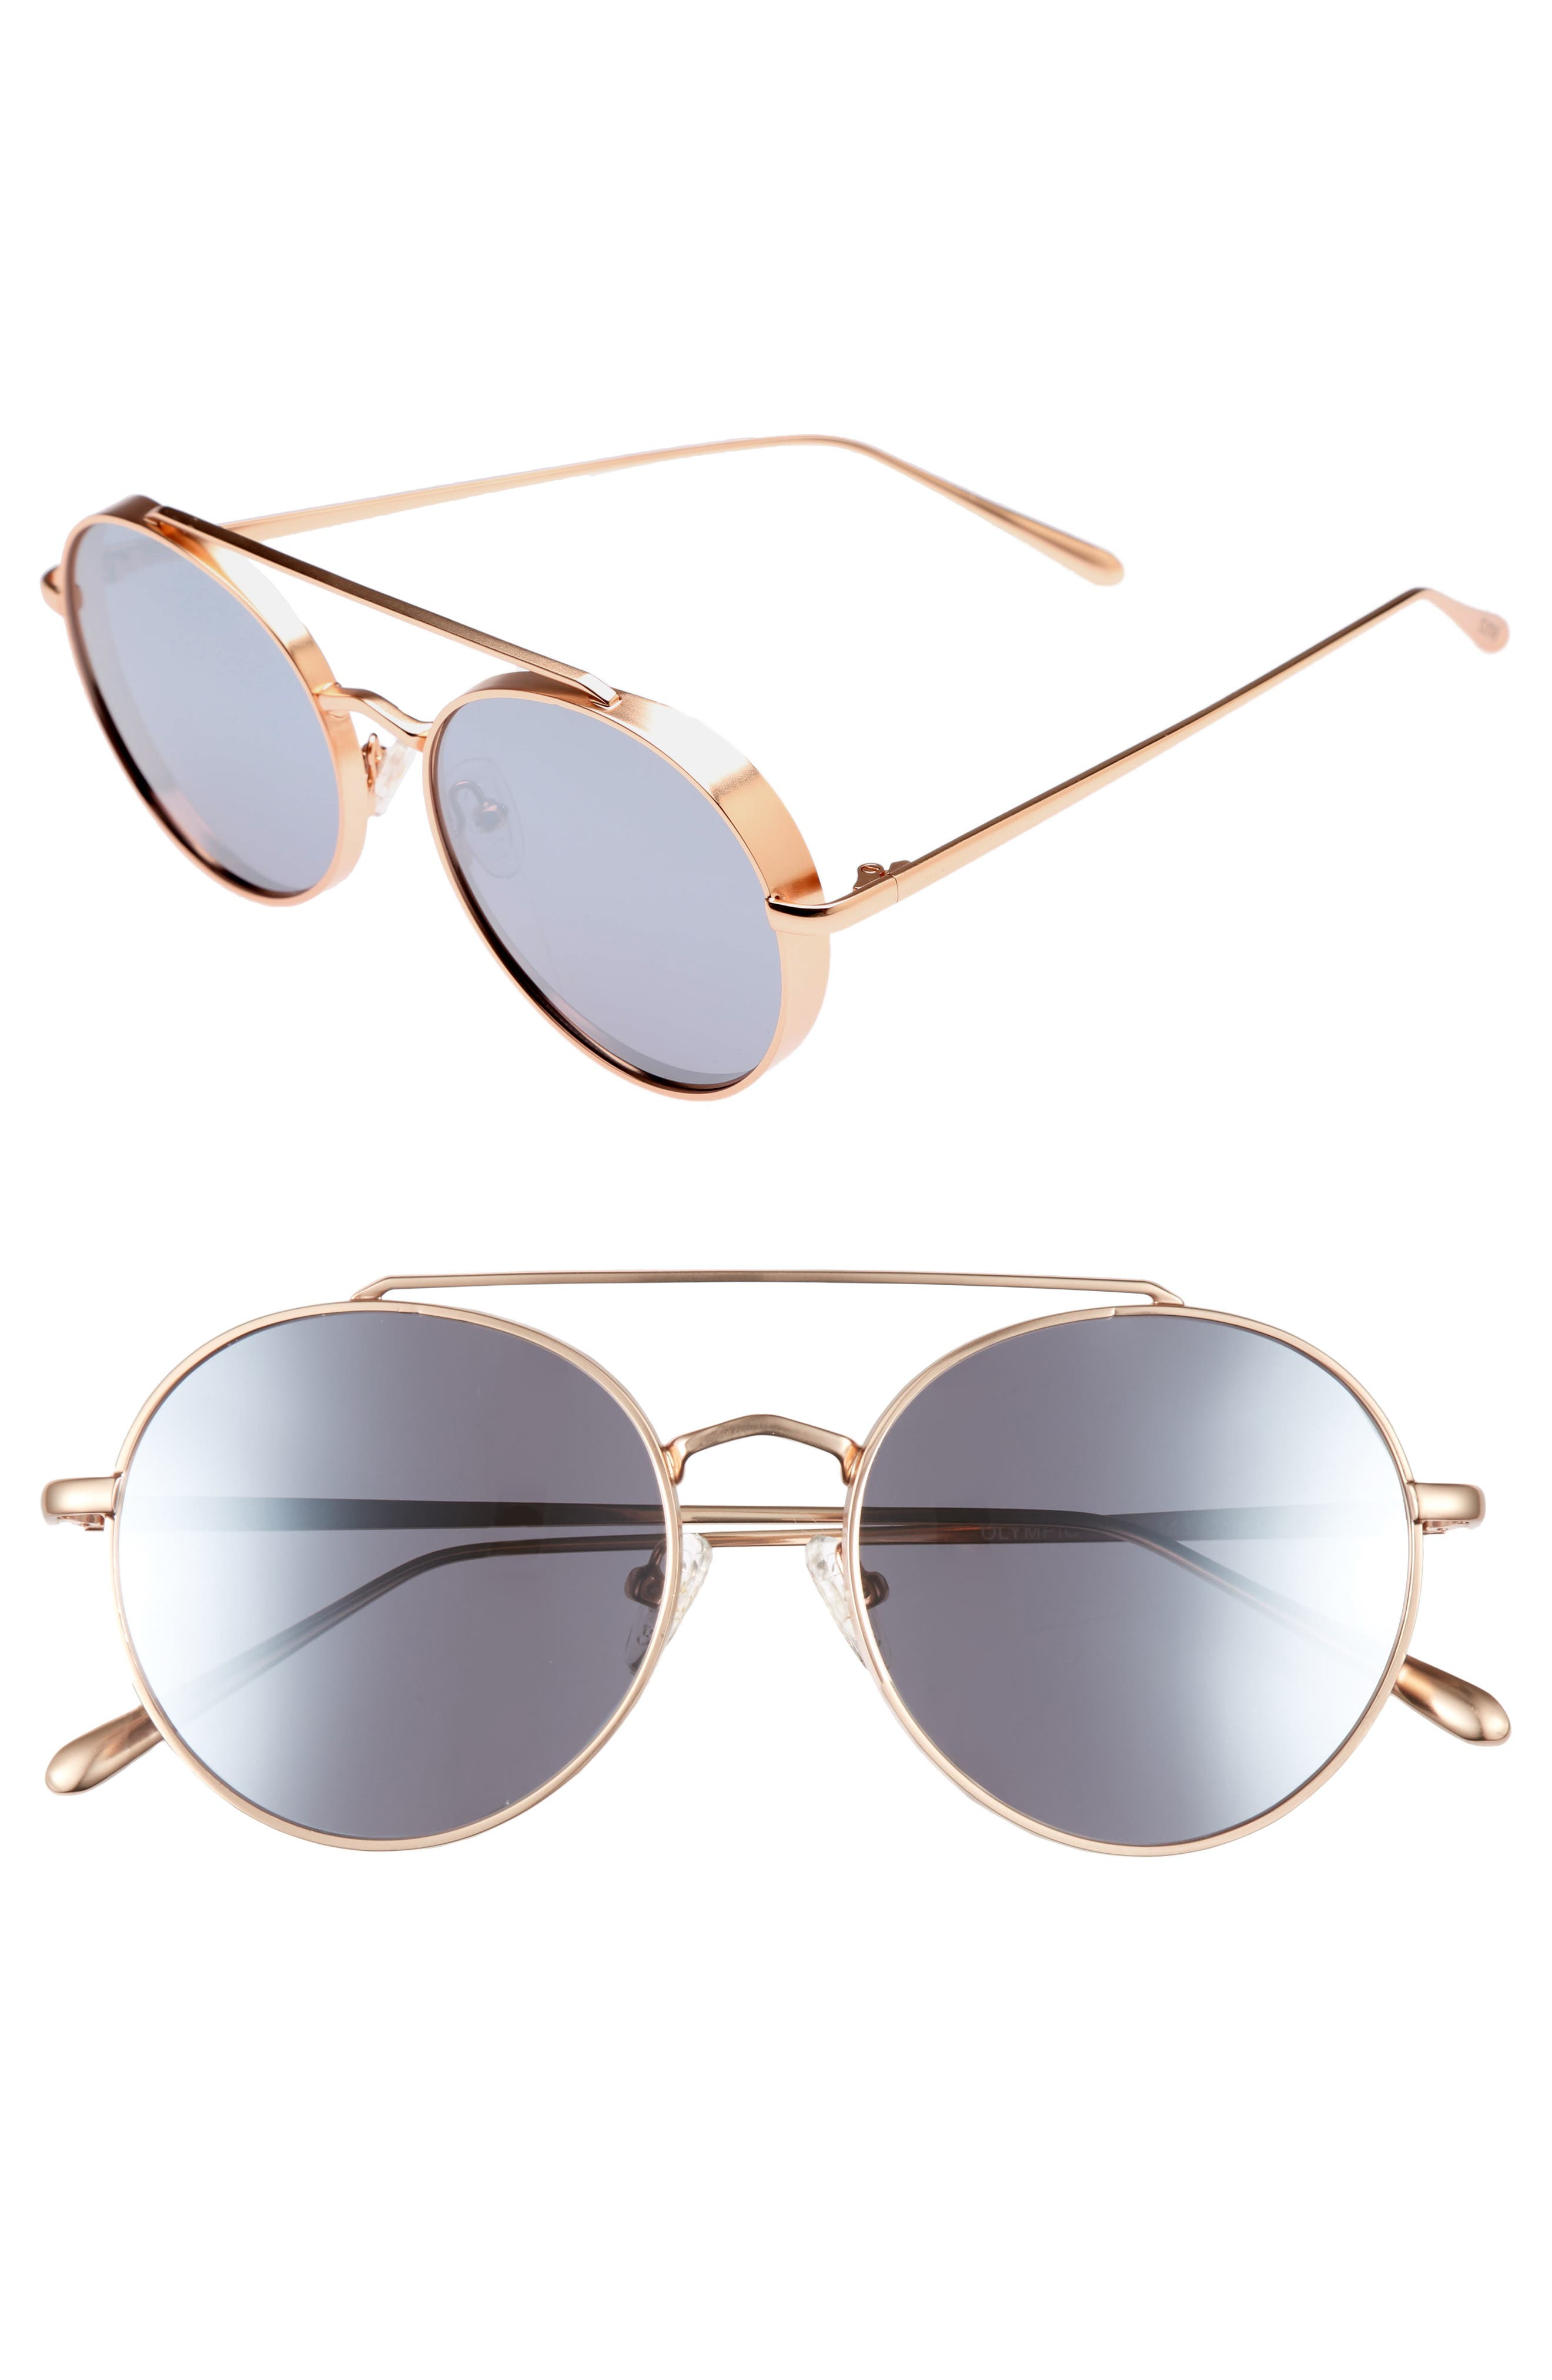 Olympic 53mm Polarized Aviator Sunglasses,                         Main,                         color, Silver